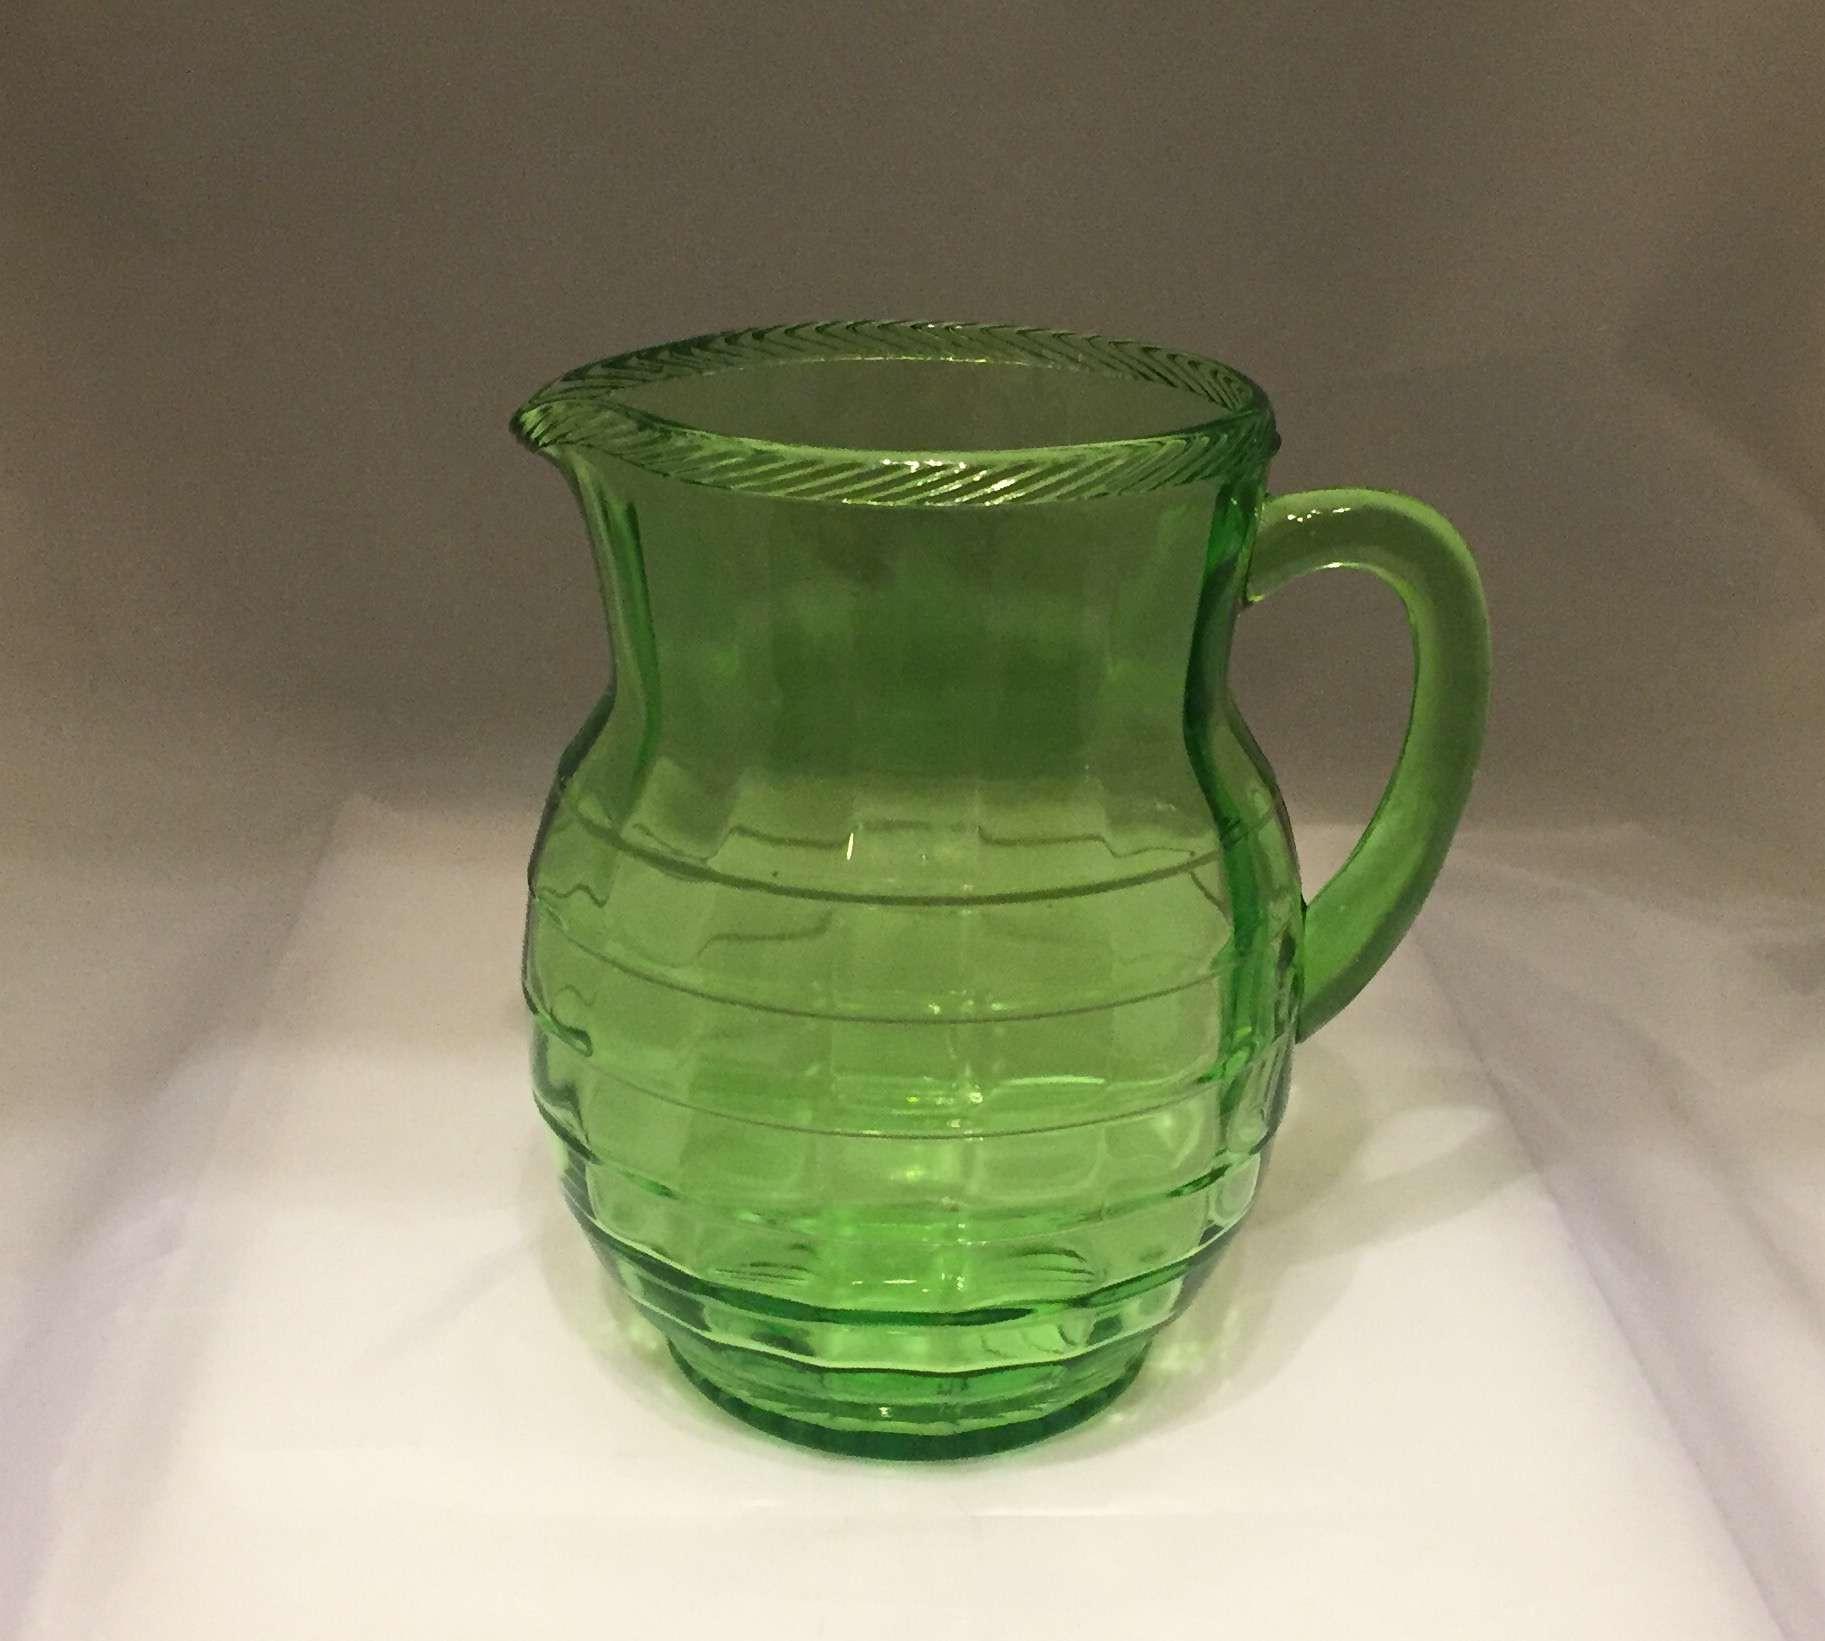 roseville iris vase of depression glass price guide and pattern identification for blockpitcher 5786c8e35f9b5831b54ecdb1